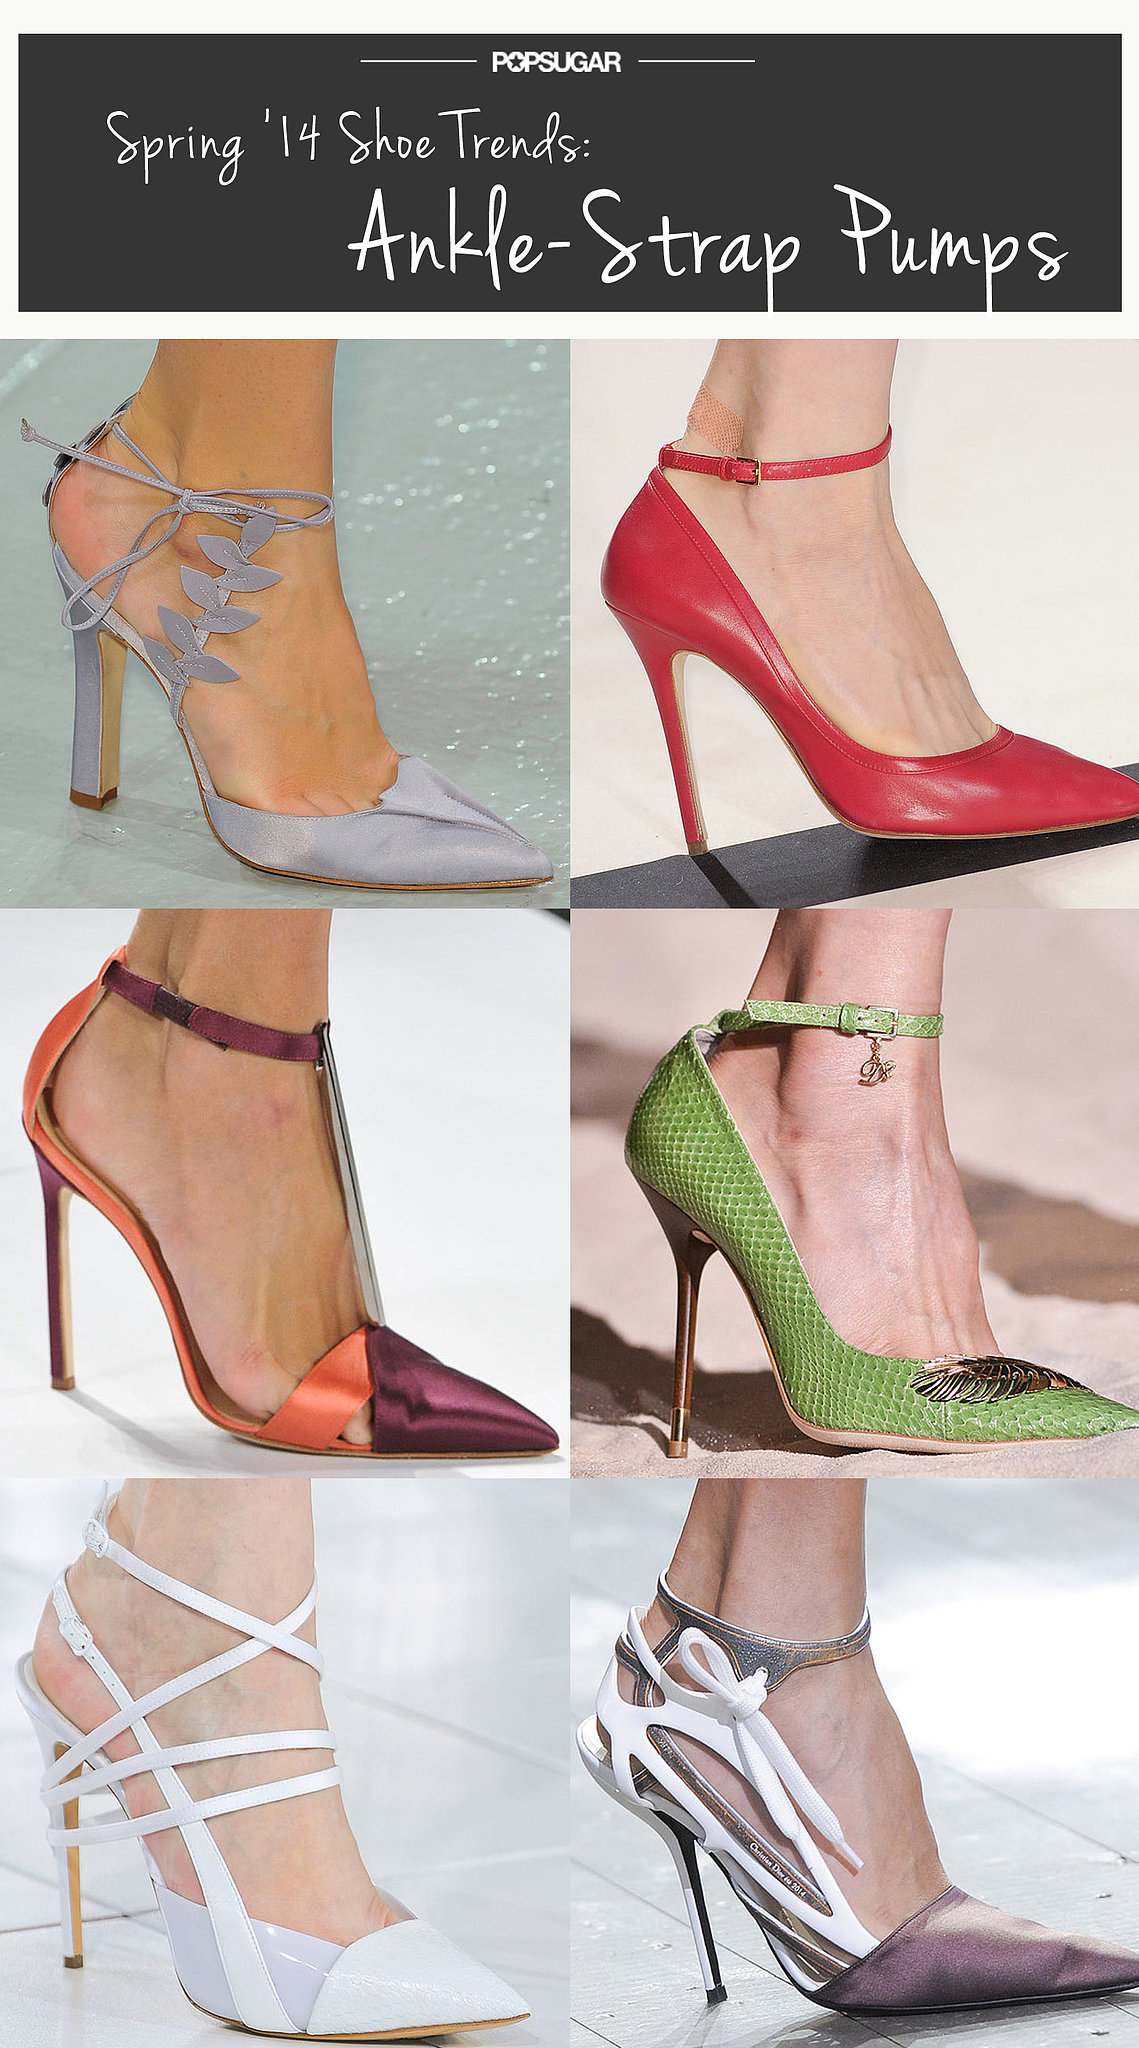 Spring Shoe Trend #1: Ankle-Strap Pumps